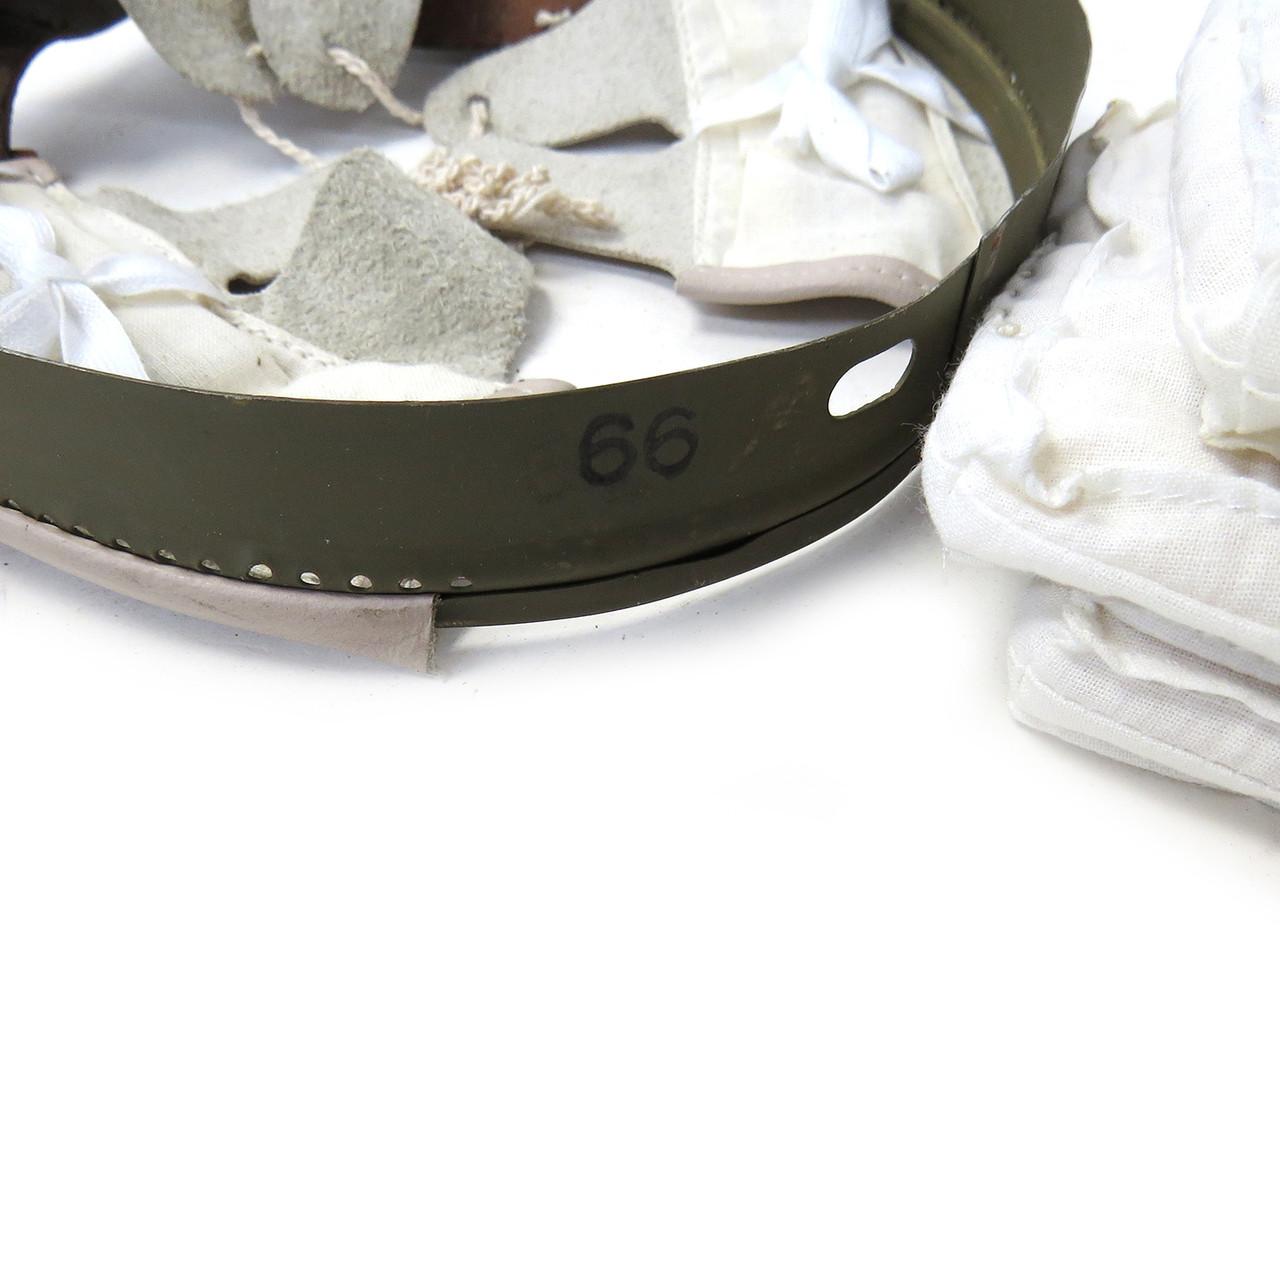 M-18 Helmet liner with pads